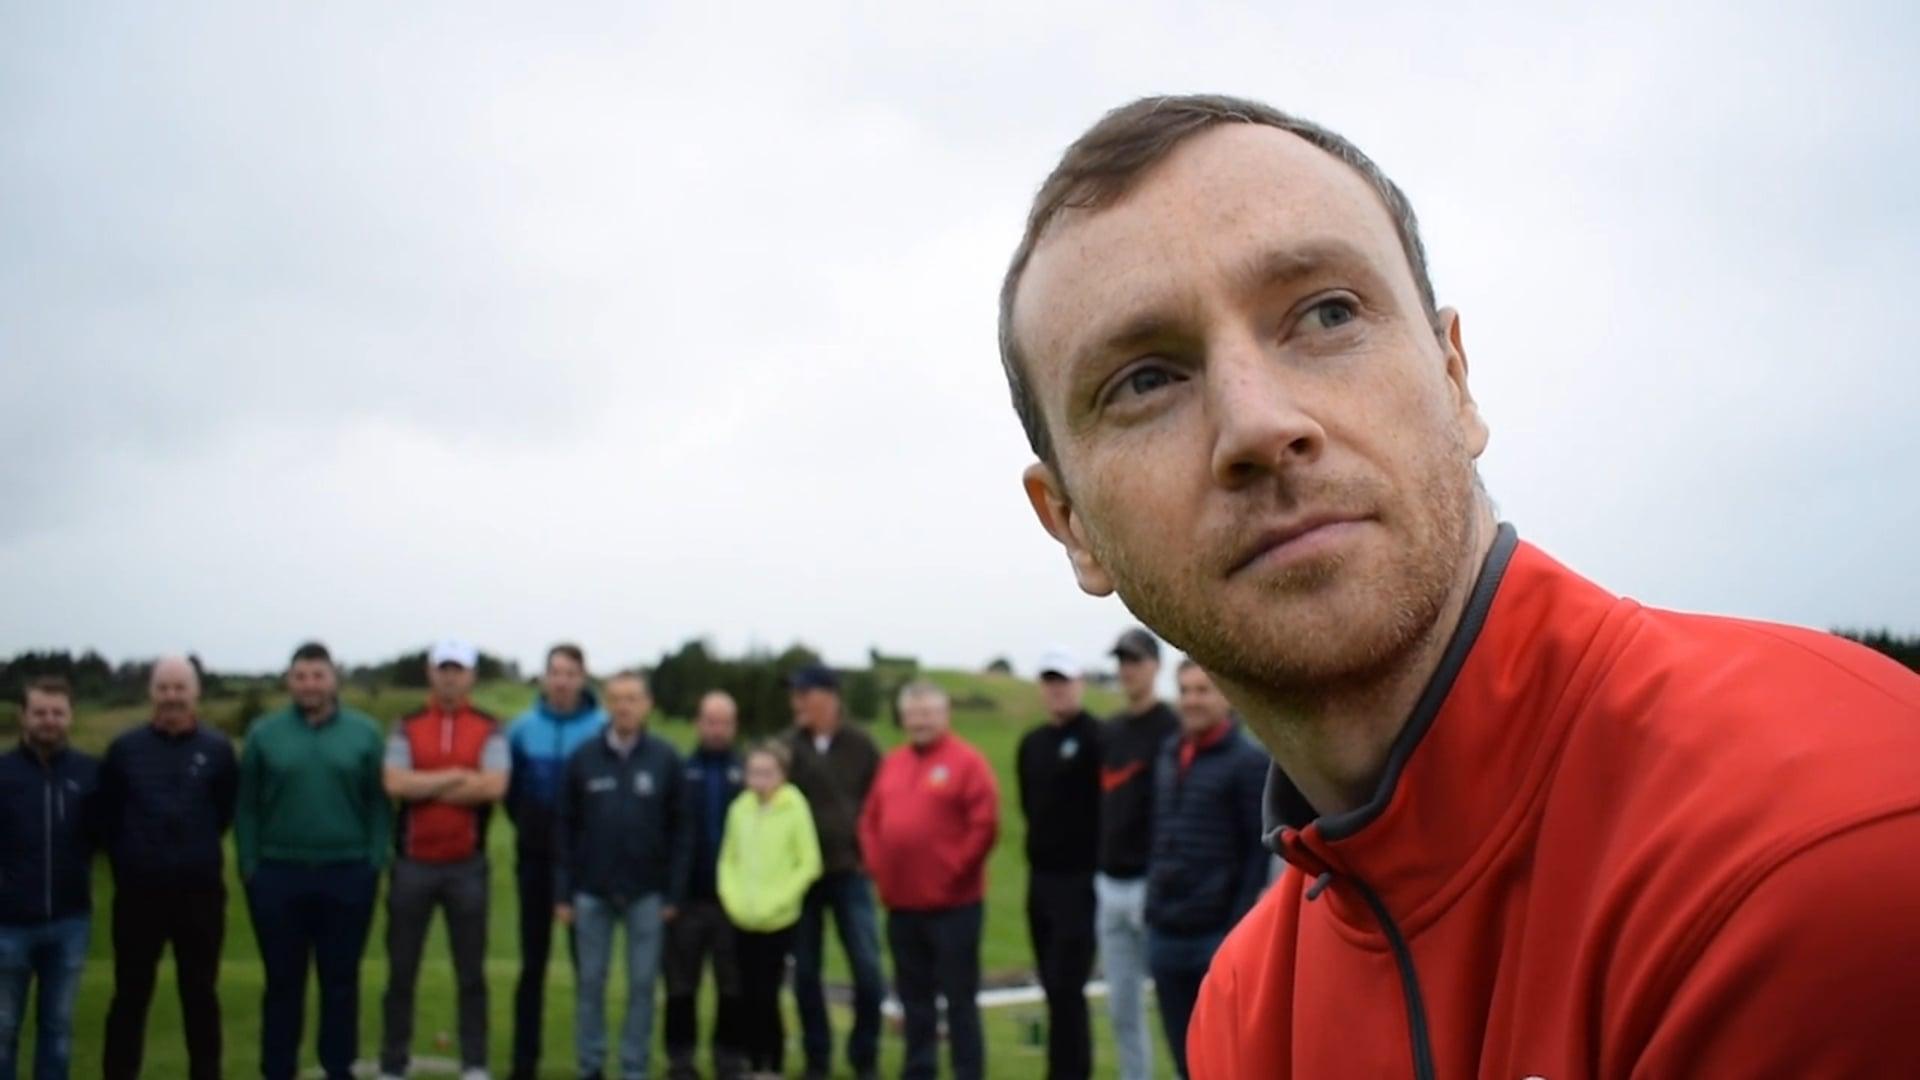 Ballyhaunis Golf Competition promo